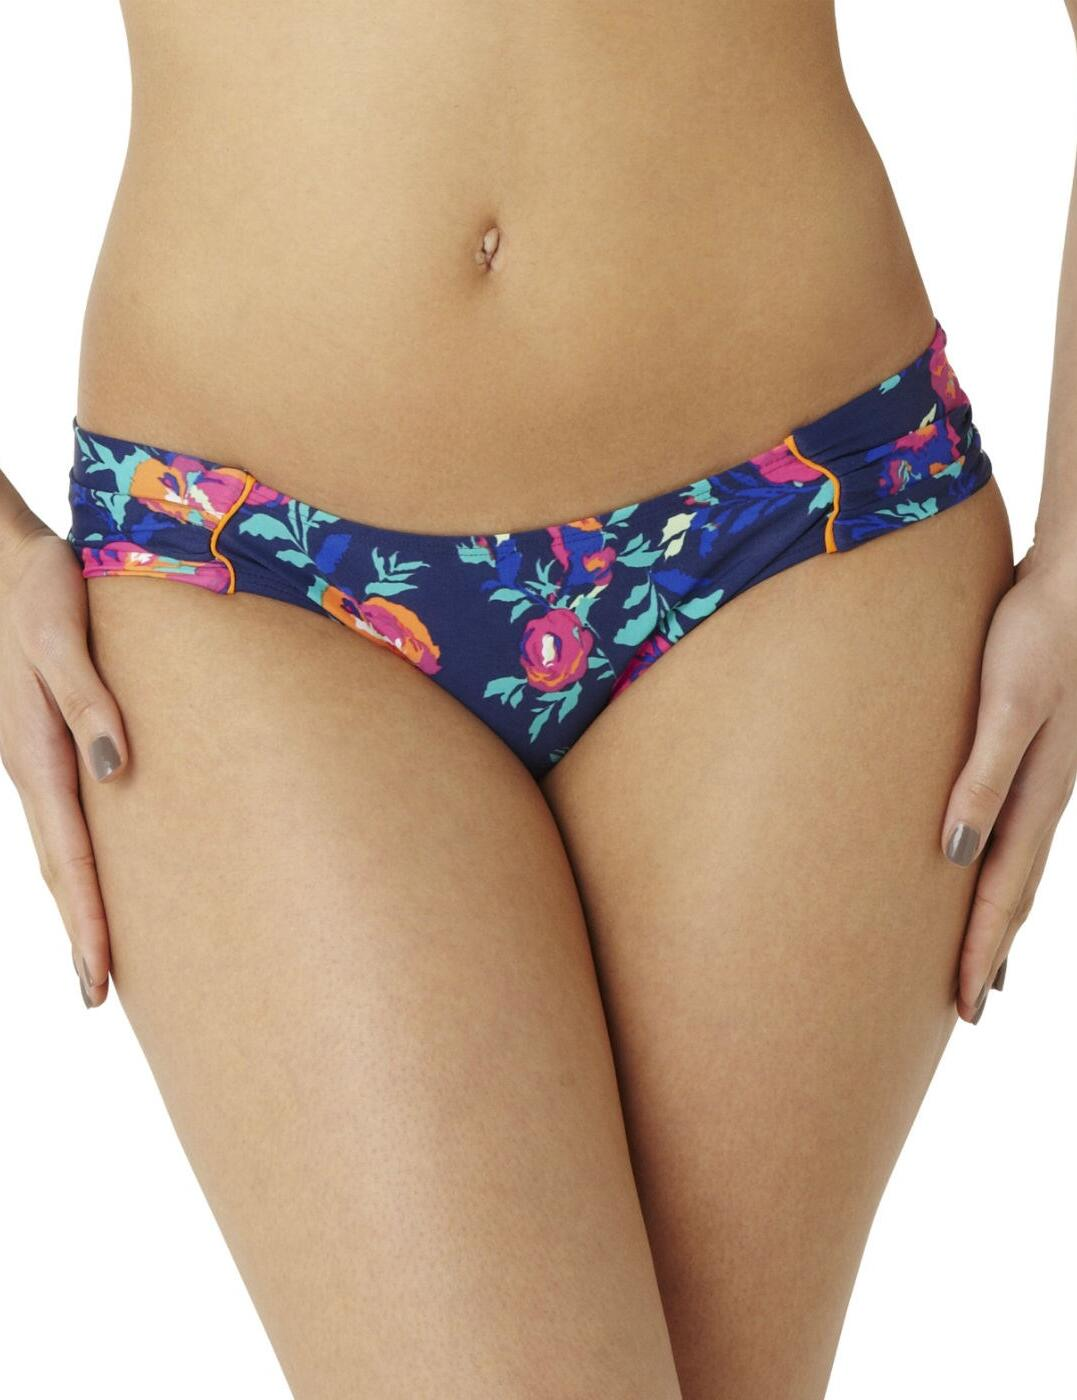 CW0156 Cleo Cassie Ruched Bikini Brief  - CW0156 Ruch Pant